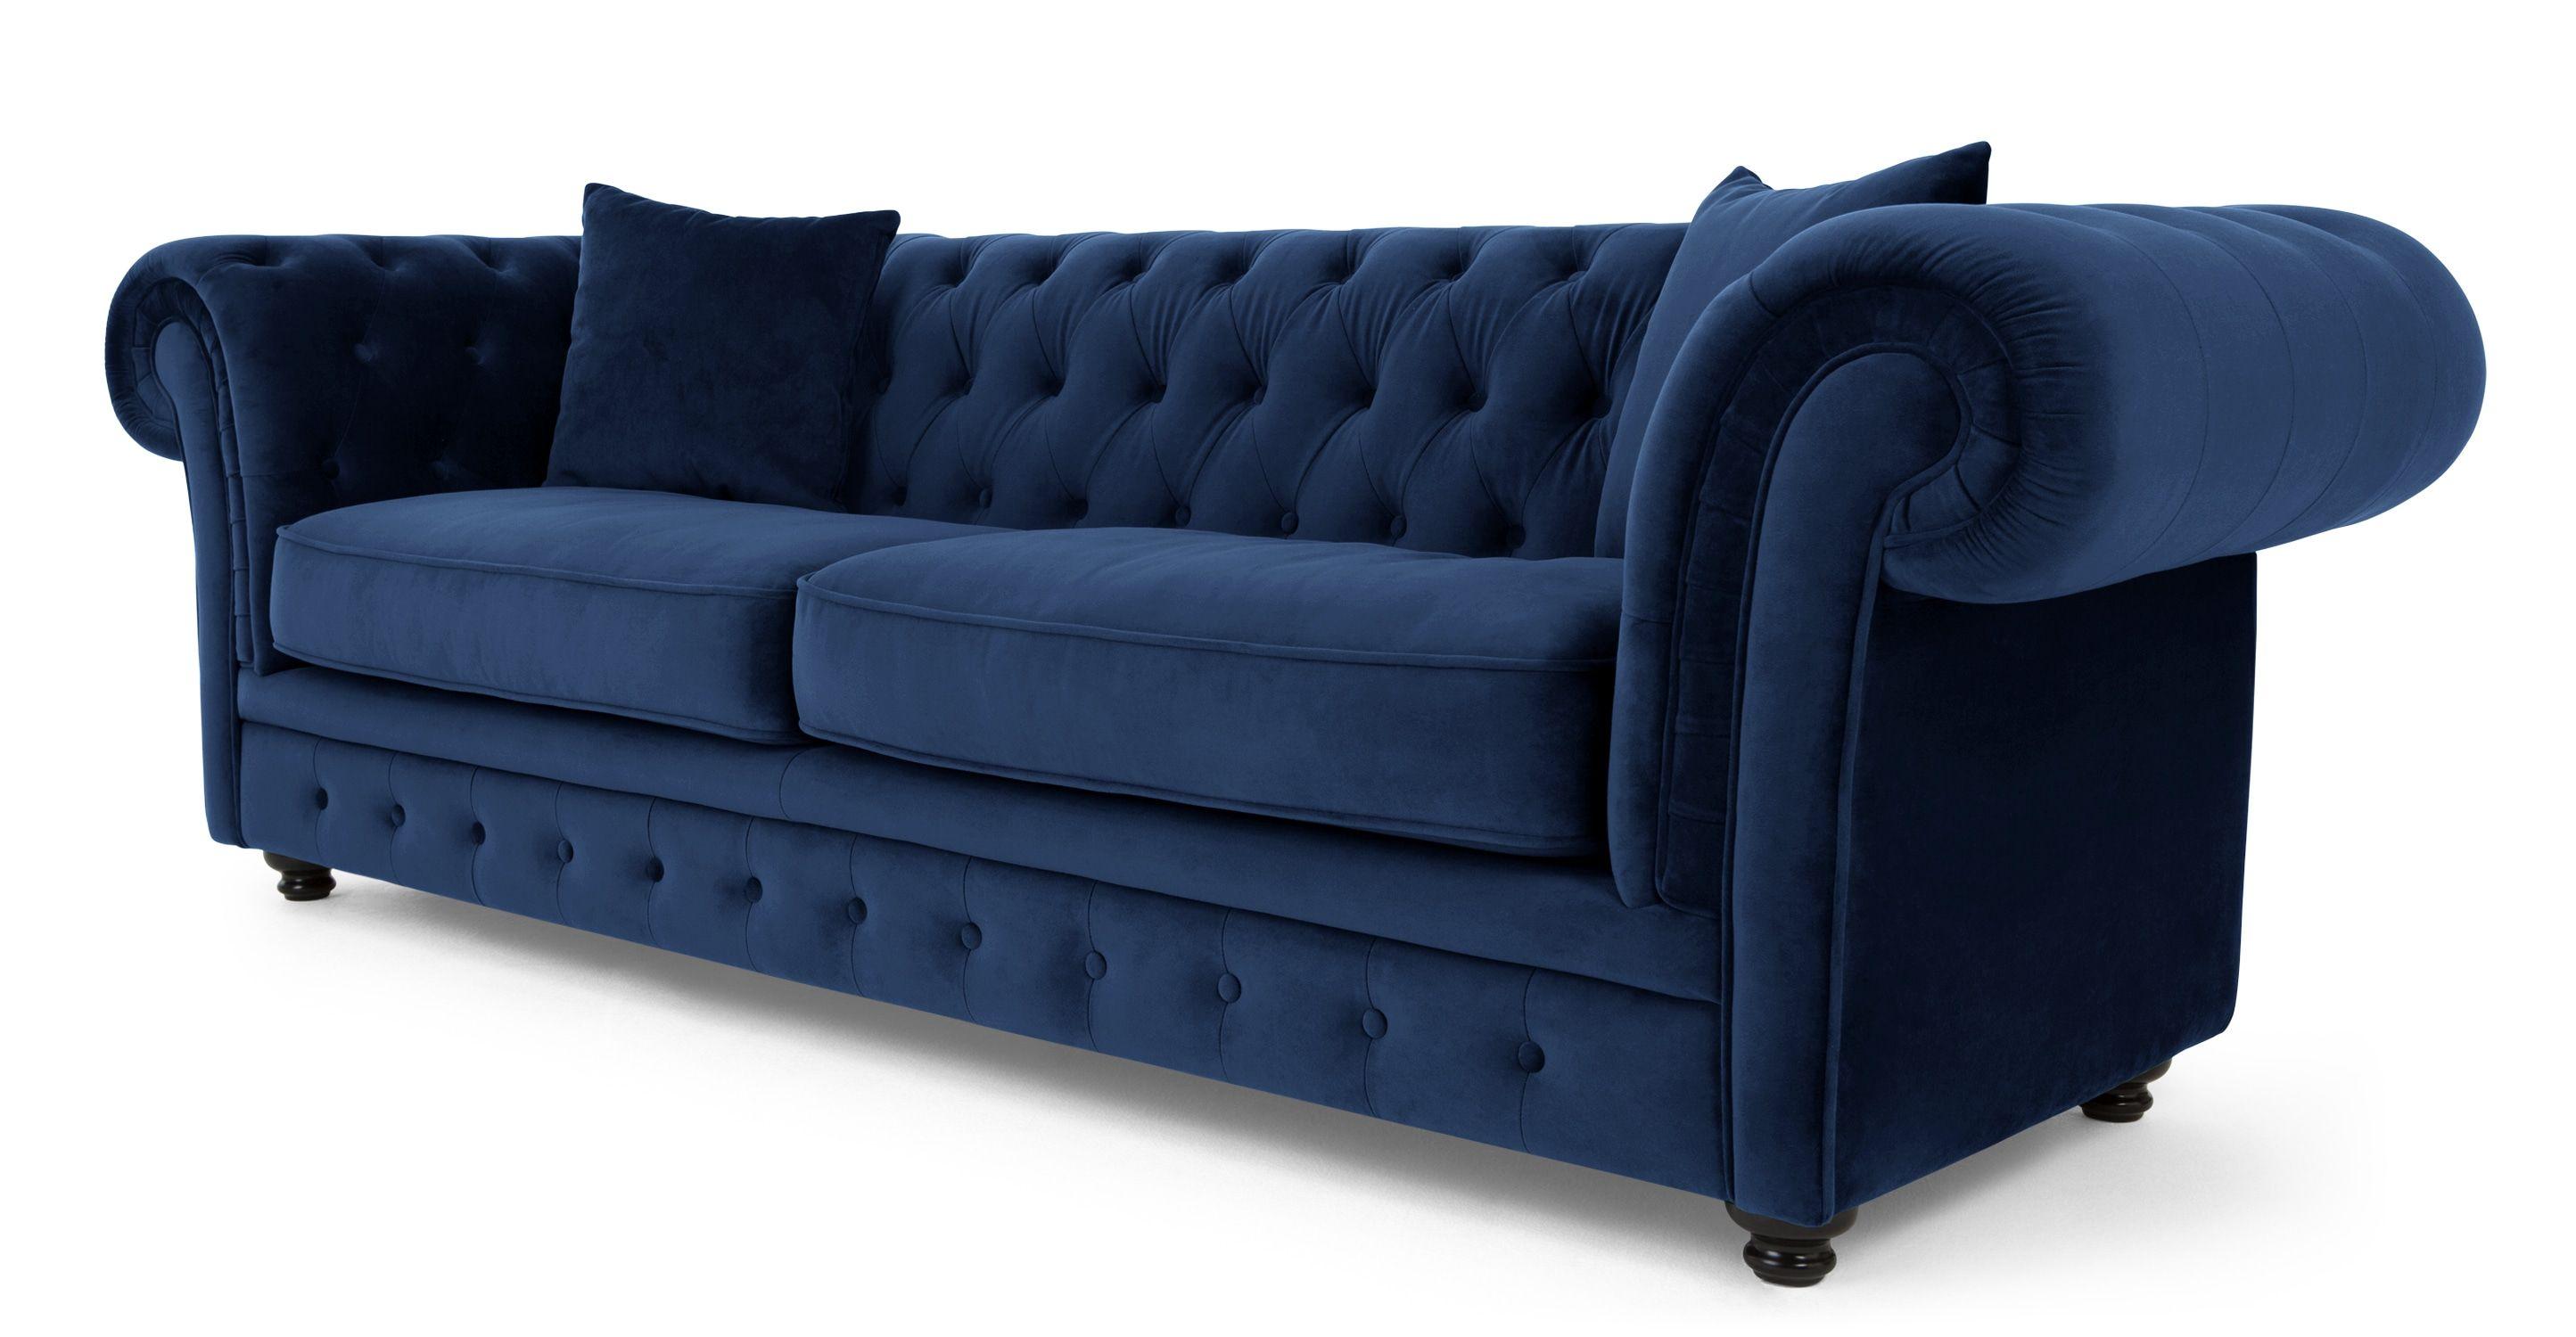 pin by ladendirekt on sofas couches pinterest rh pinterest jp